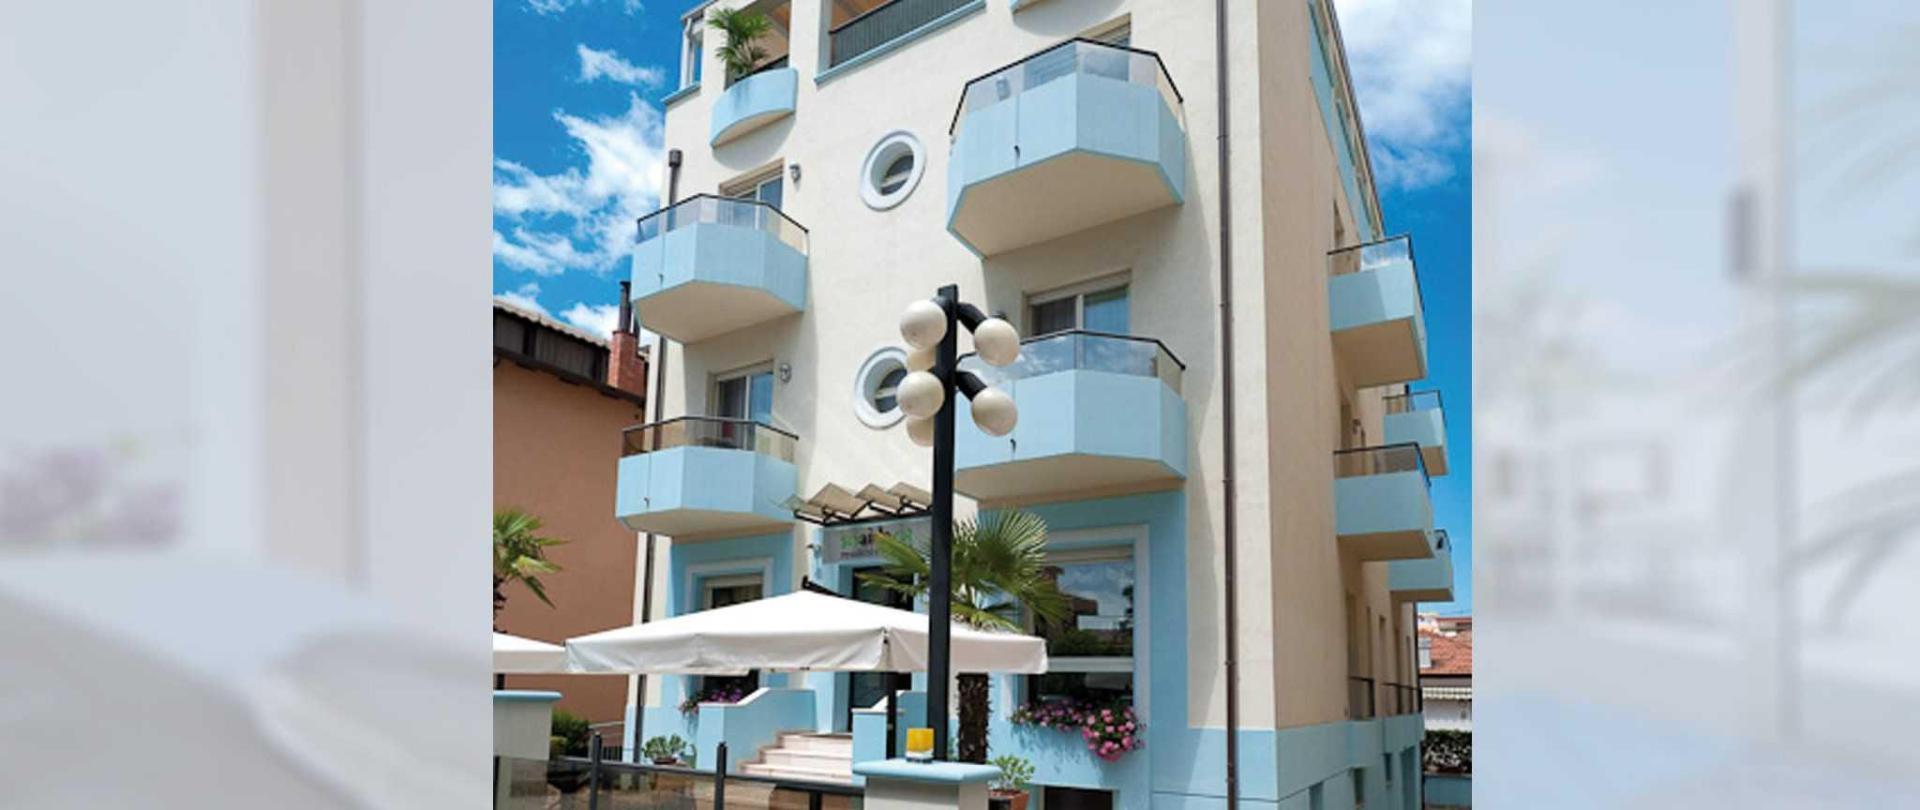 zolder-apartment-aida-3.jpg